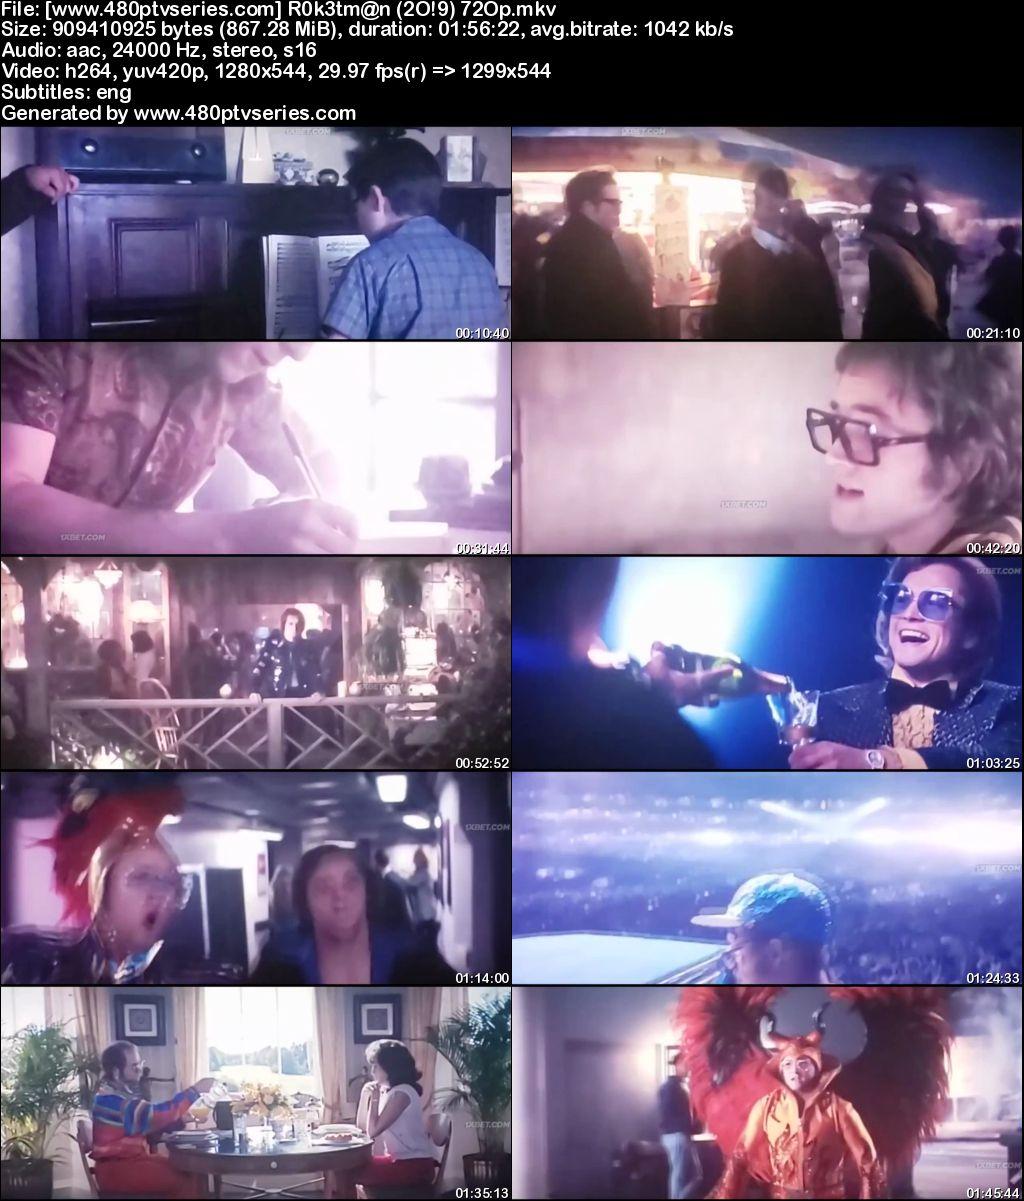 Watch Online Free Rocketman (2019) Full English Movie Download 480p 720p HD-CAM